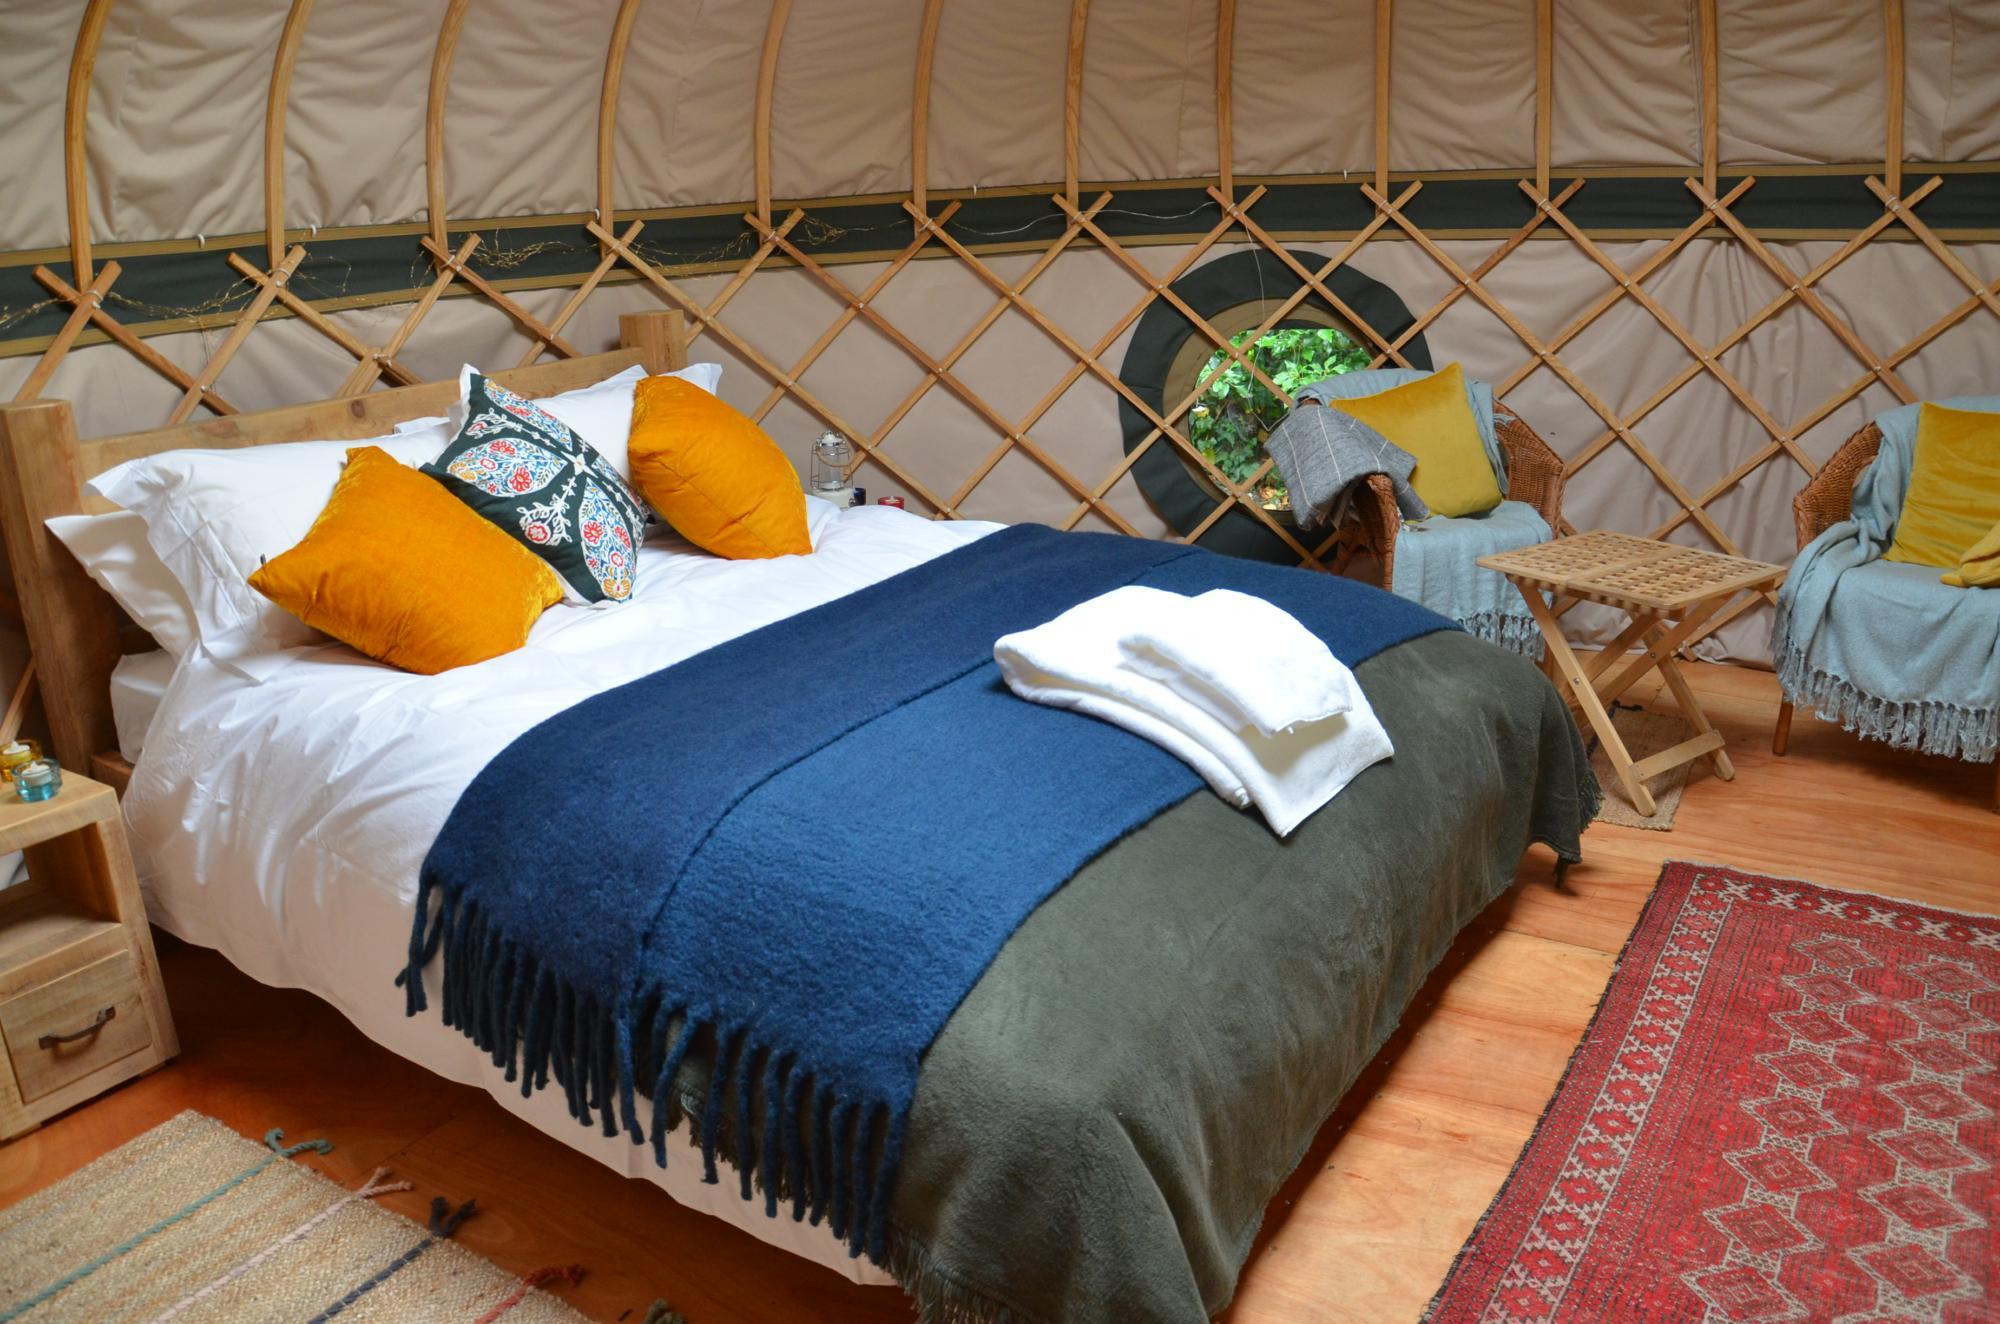 Glamping in Stamford – Cool Camping